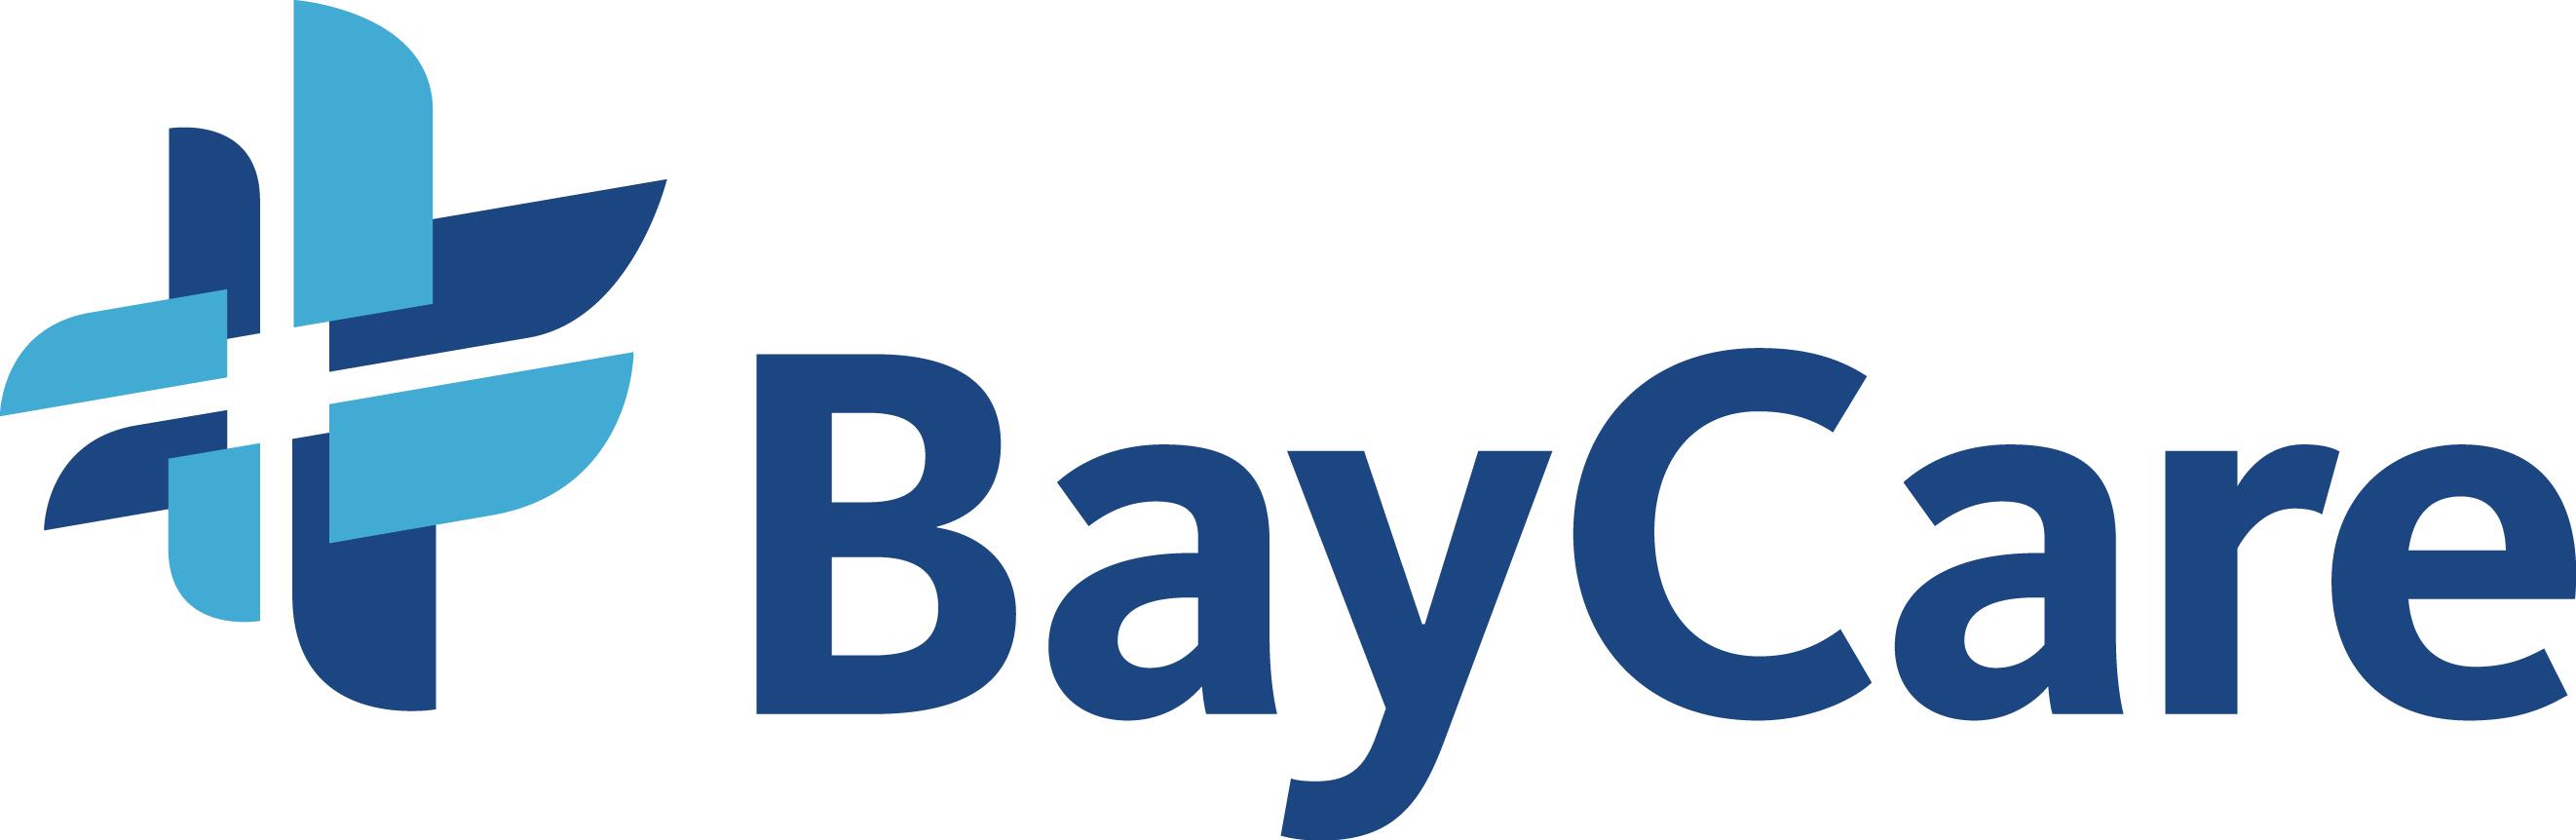 BayCare-Quality Sharing Day logo